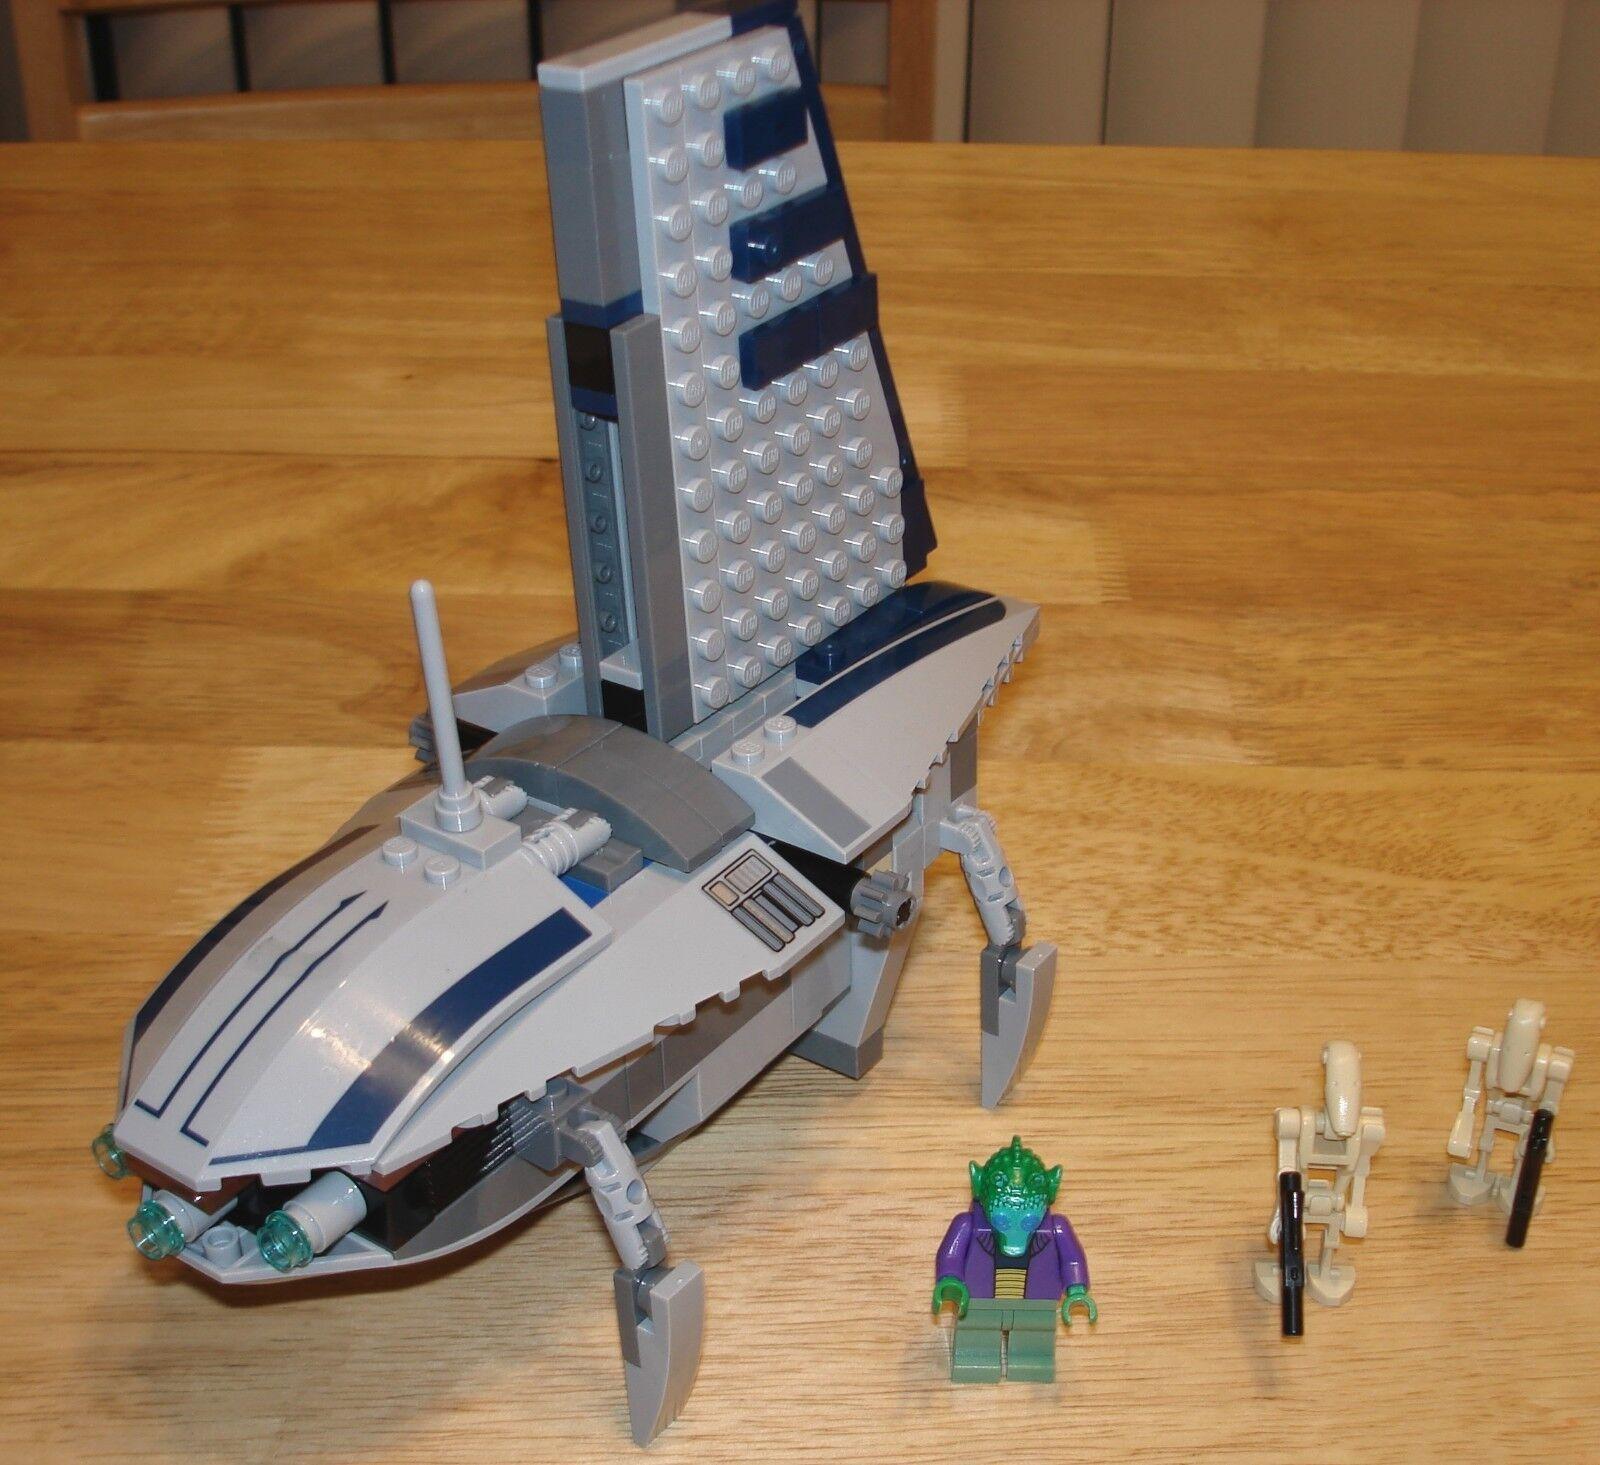 Lego Star Wars séparatistes navette Set 8036 100% complet avec instructions